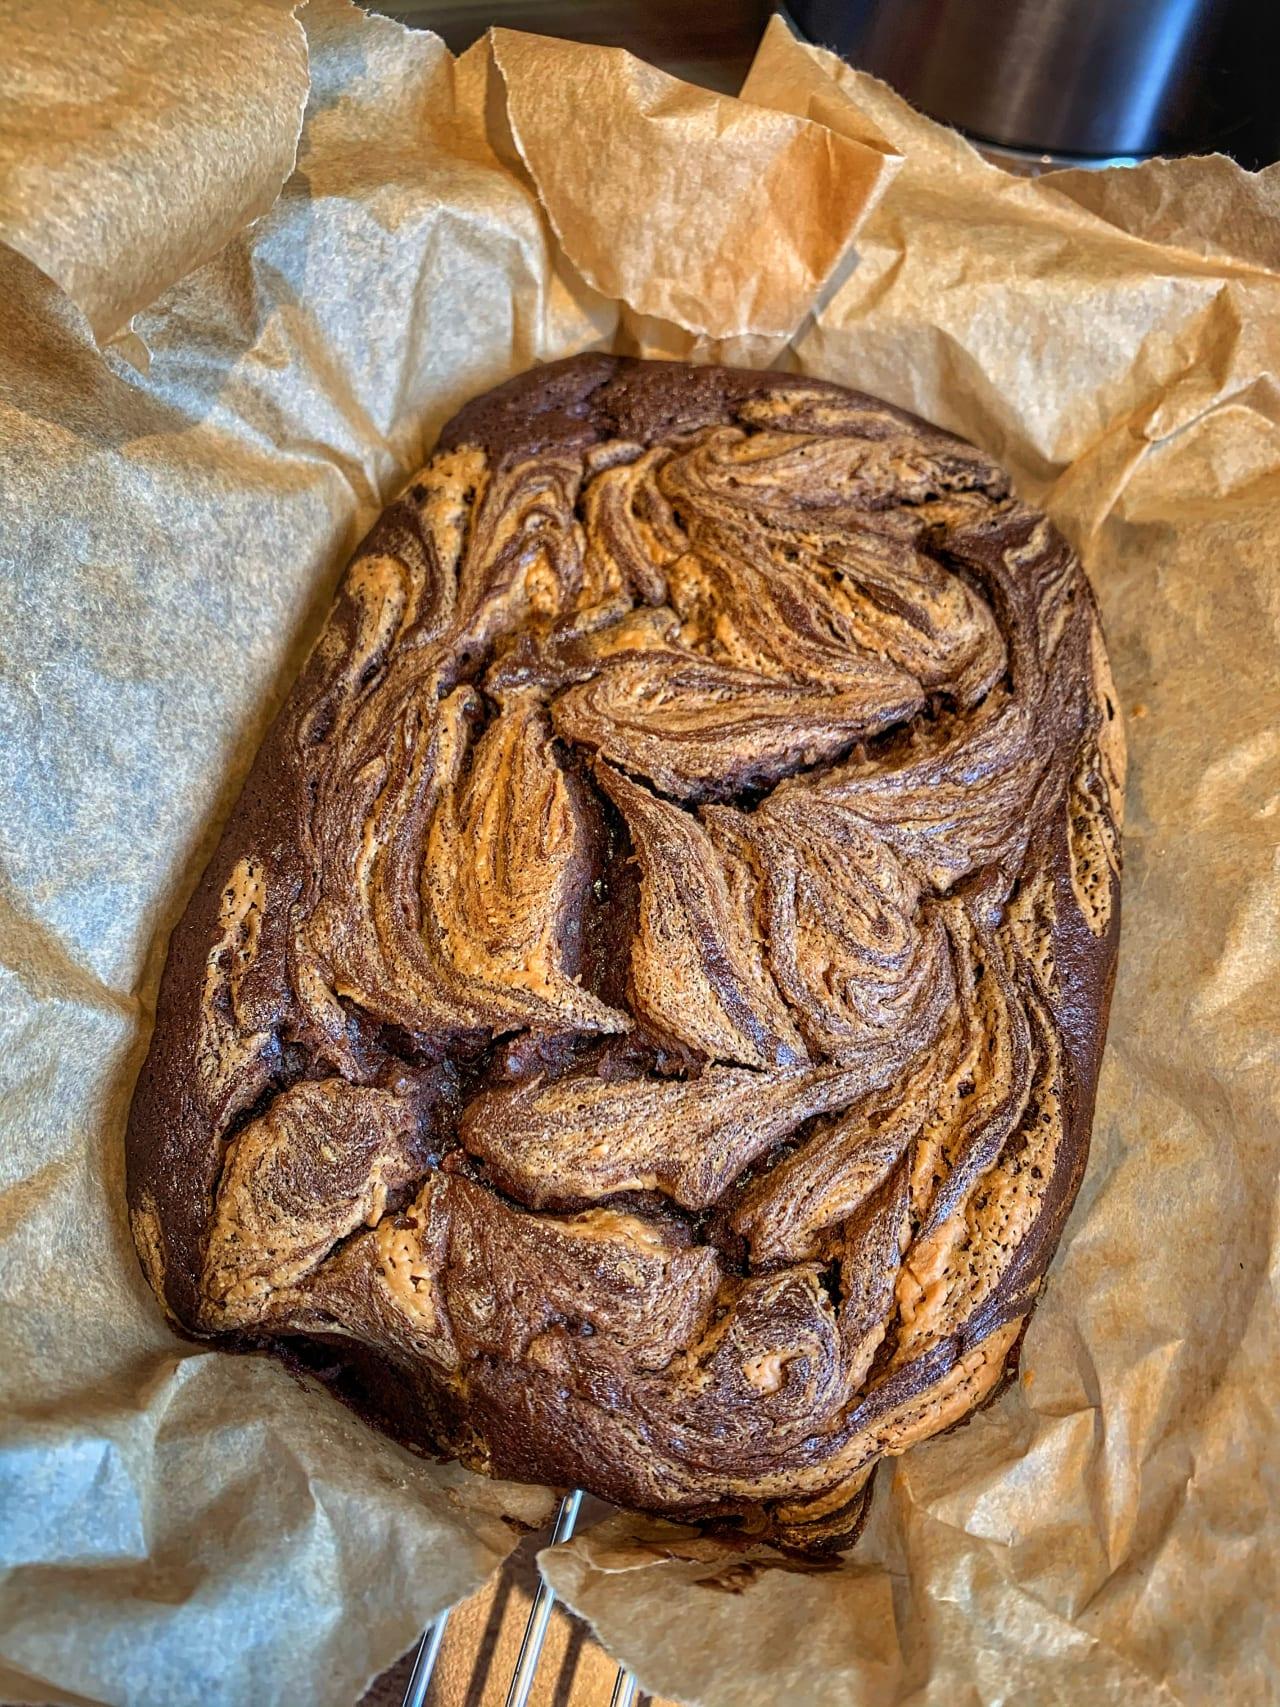 Chocolate Banana and Biscoff 'Brownies'